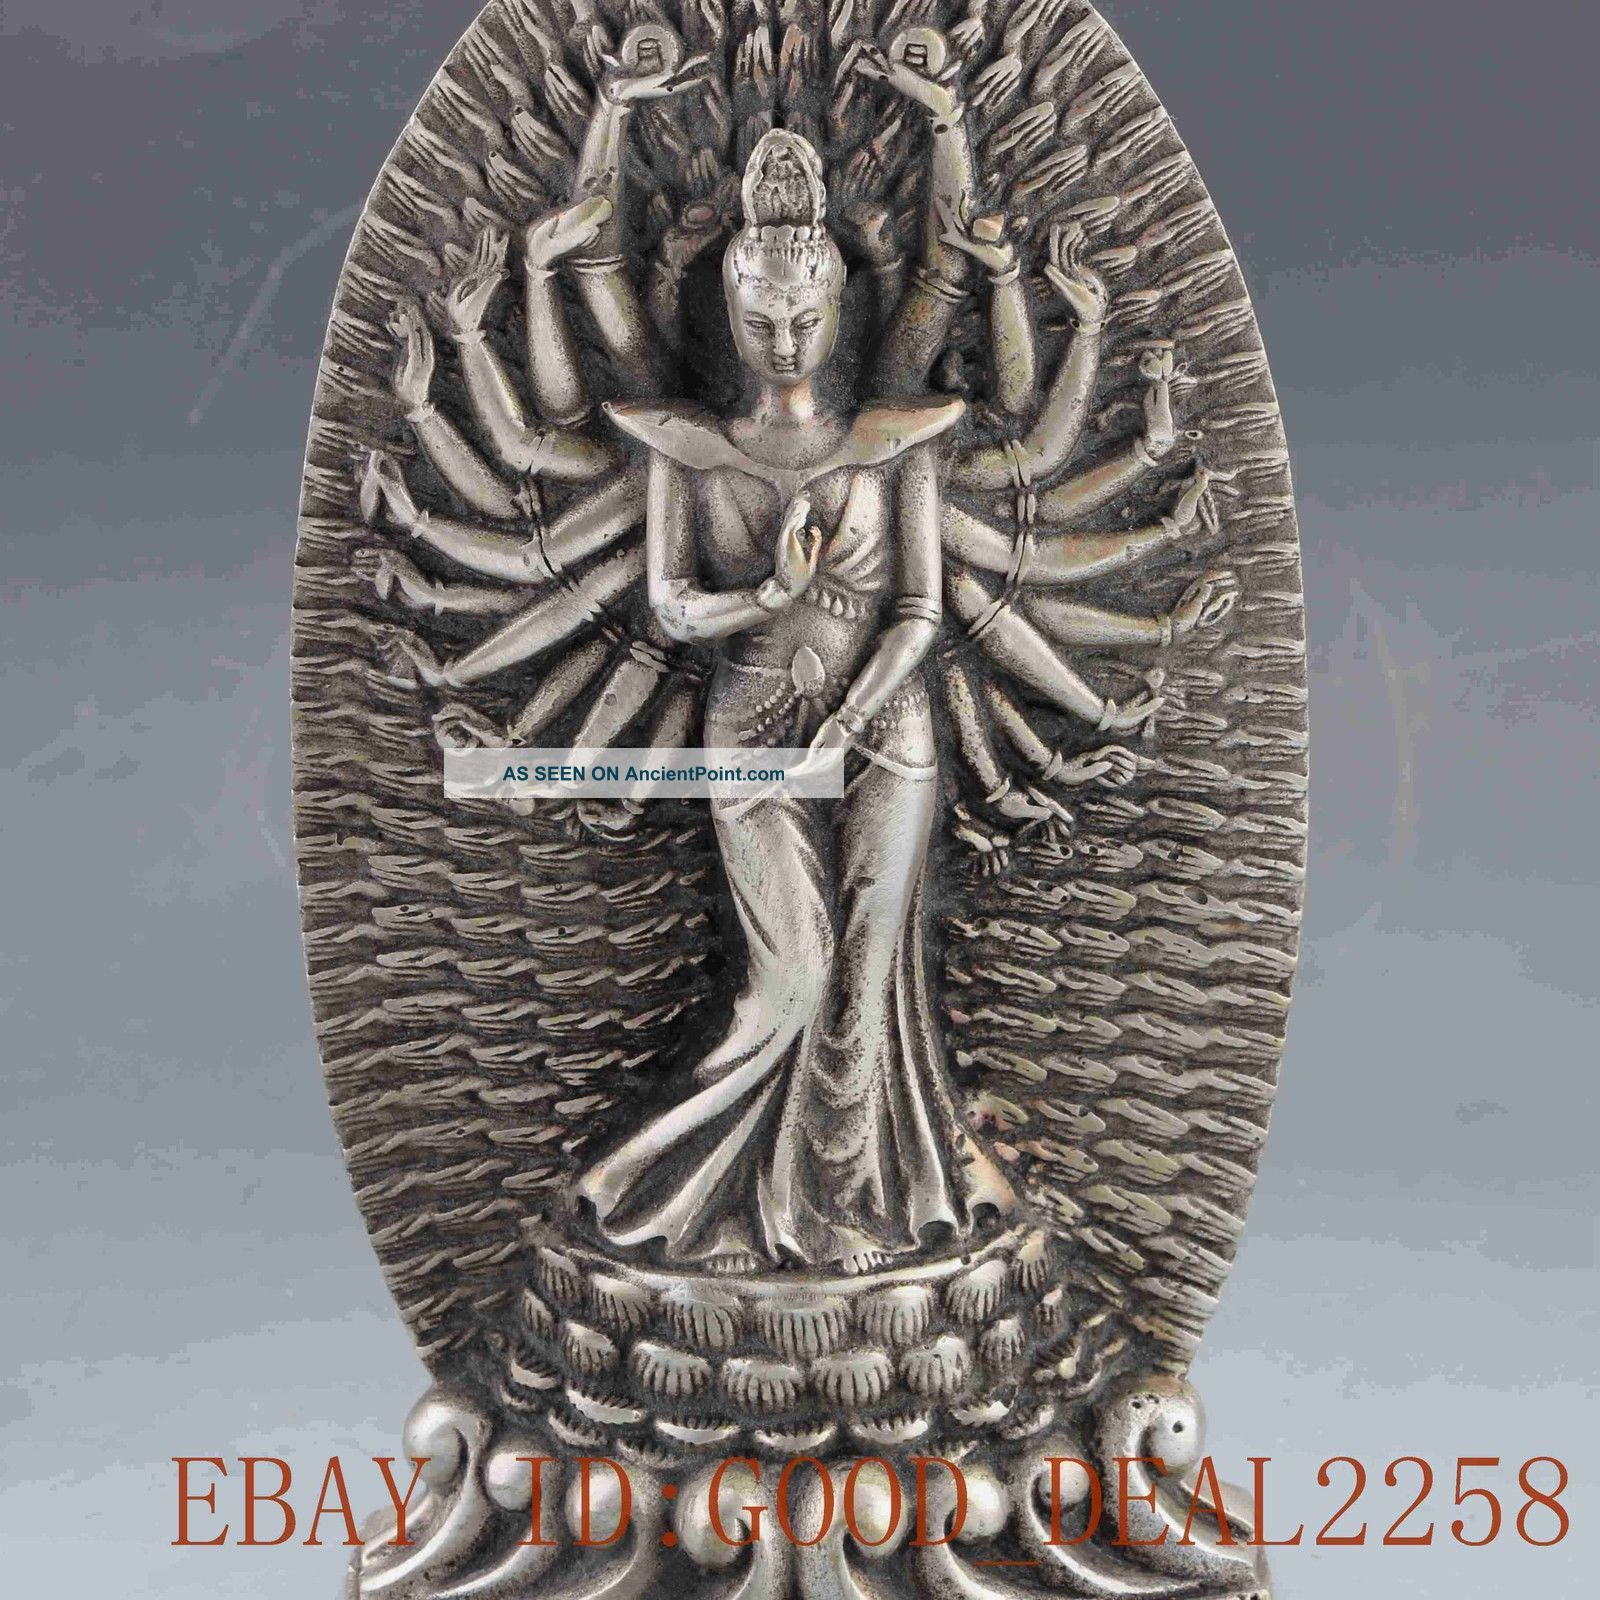 Miao Silver Carving Thousand Hand Prayer The Kindly Big Kwan Yin - Statute Buddha photo